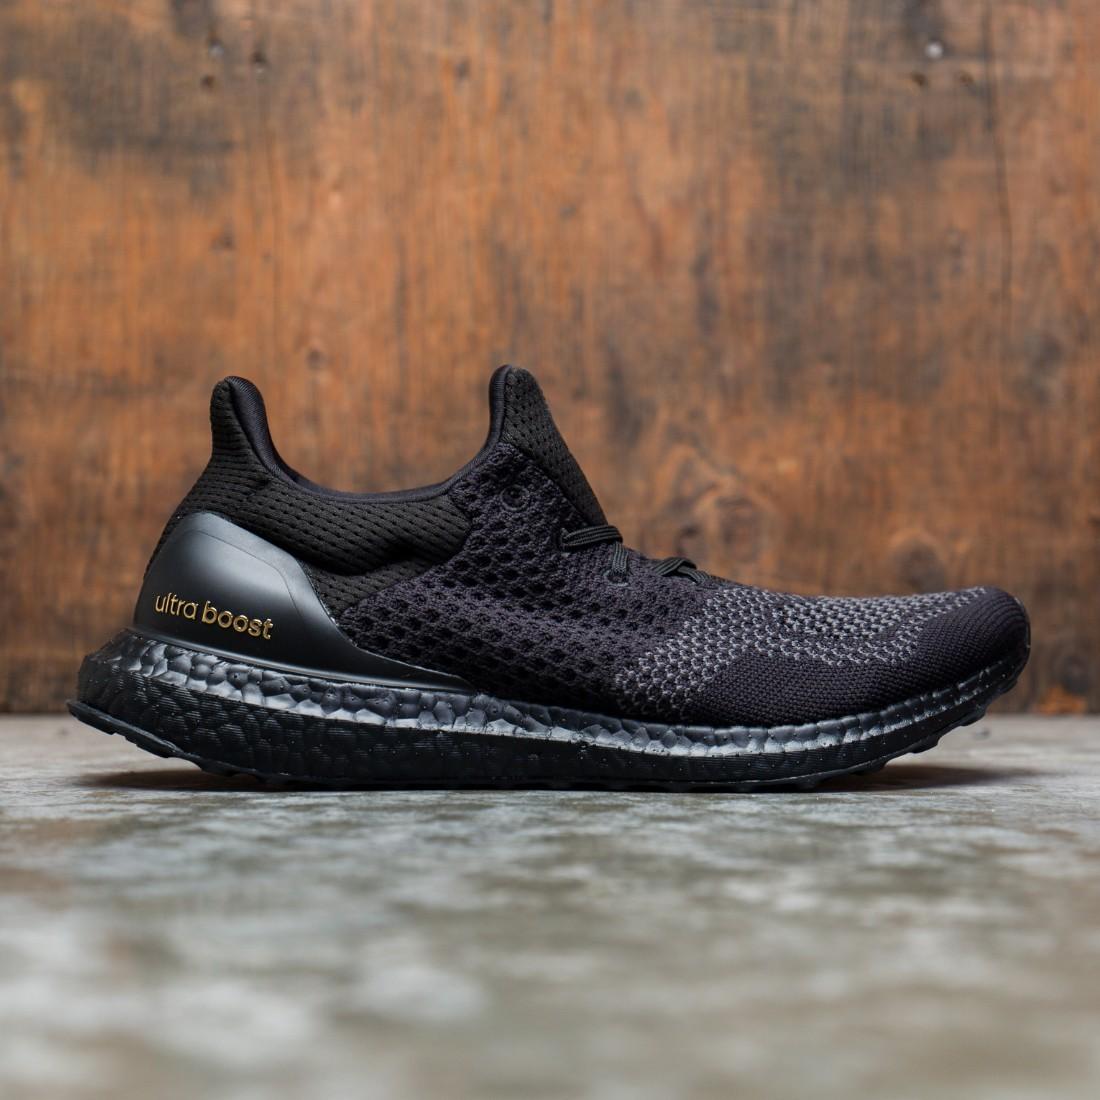 Adidas Men UltraBOOST 1.0 DNA (black / core black / grey)